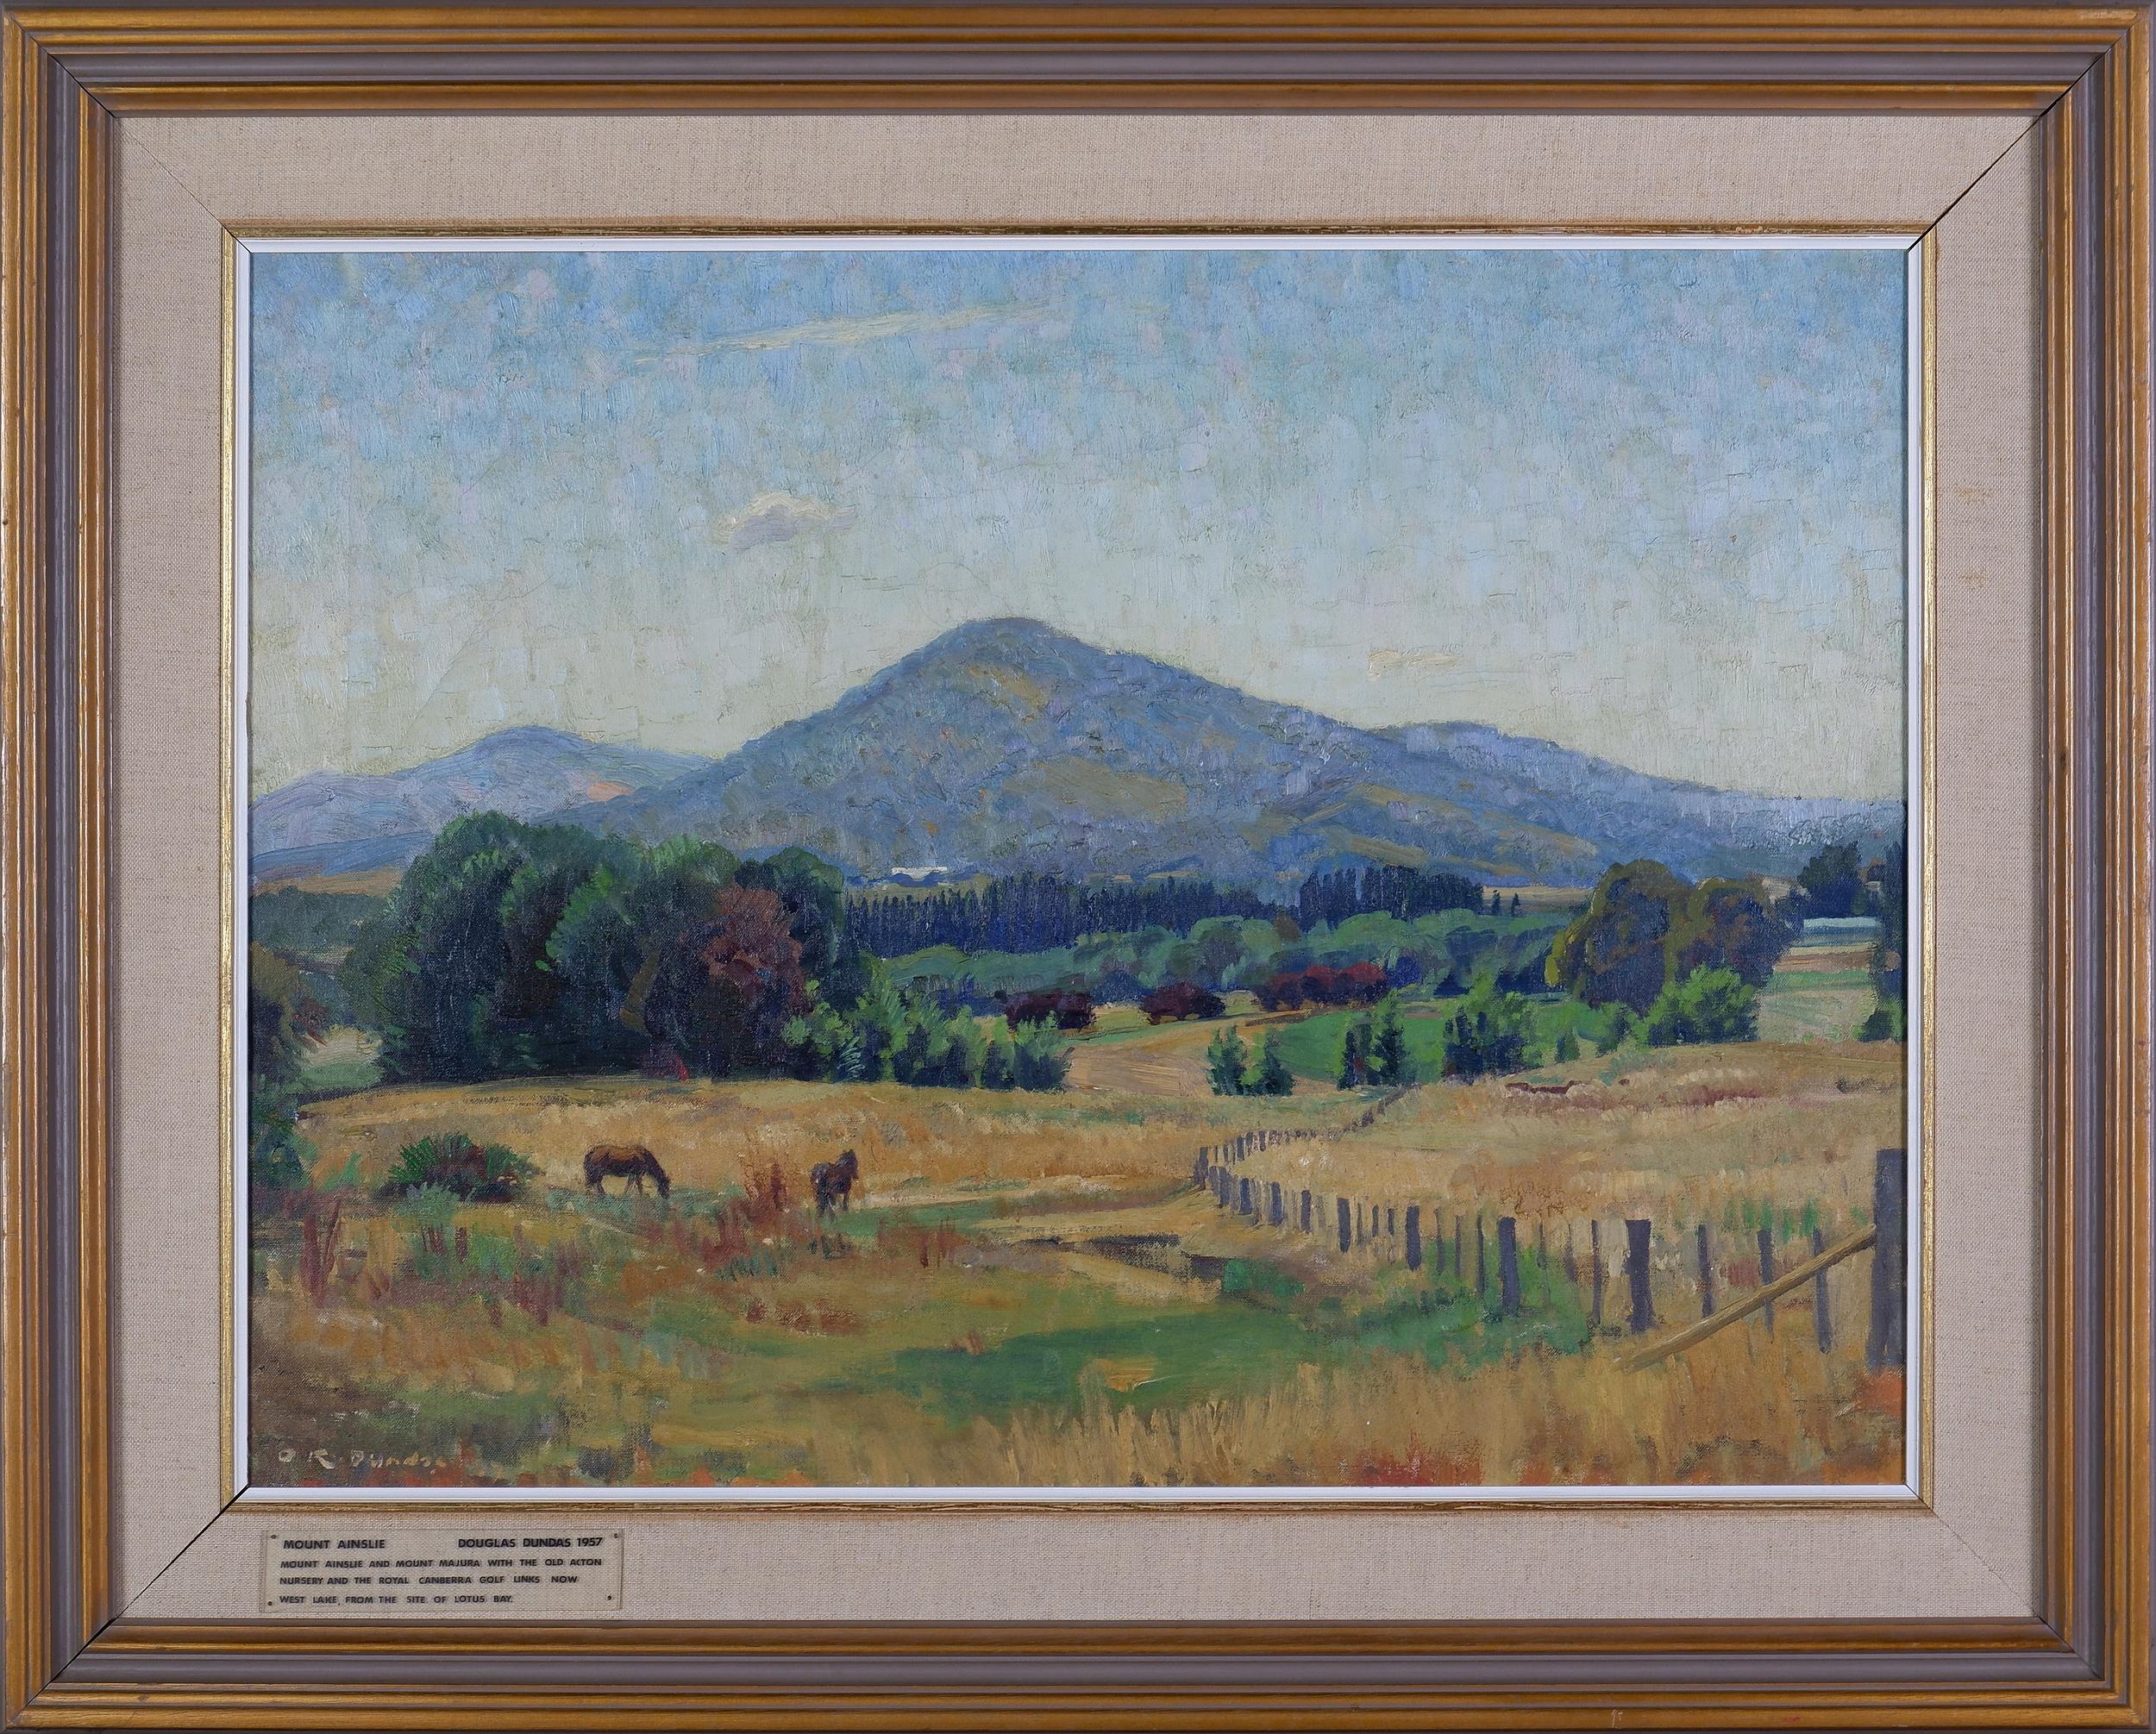 'Douglas Dundas (1900-1981), Mount Ainslie 1957, Oil on Canvas'